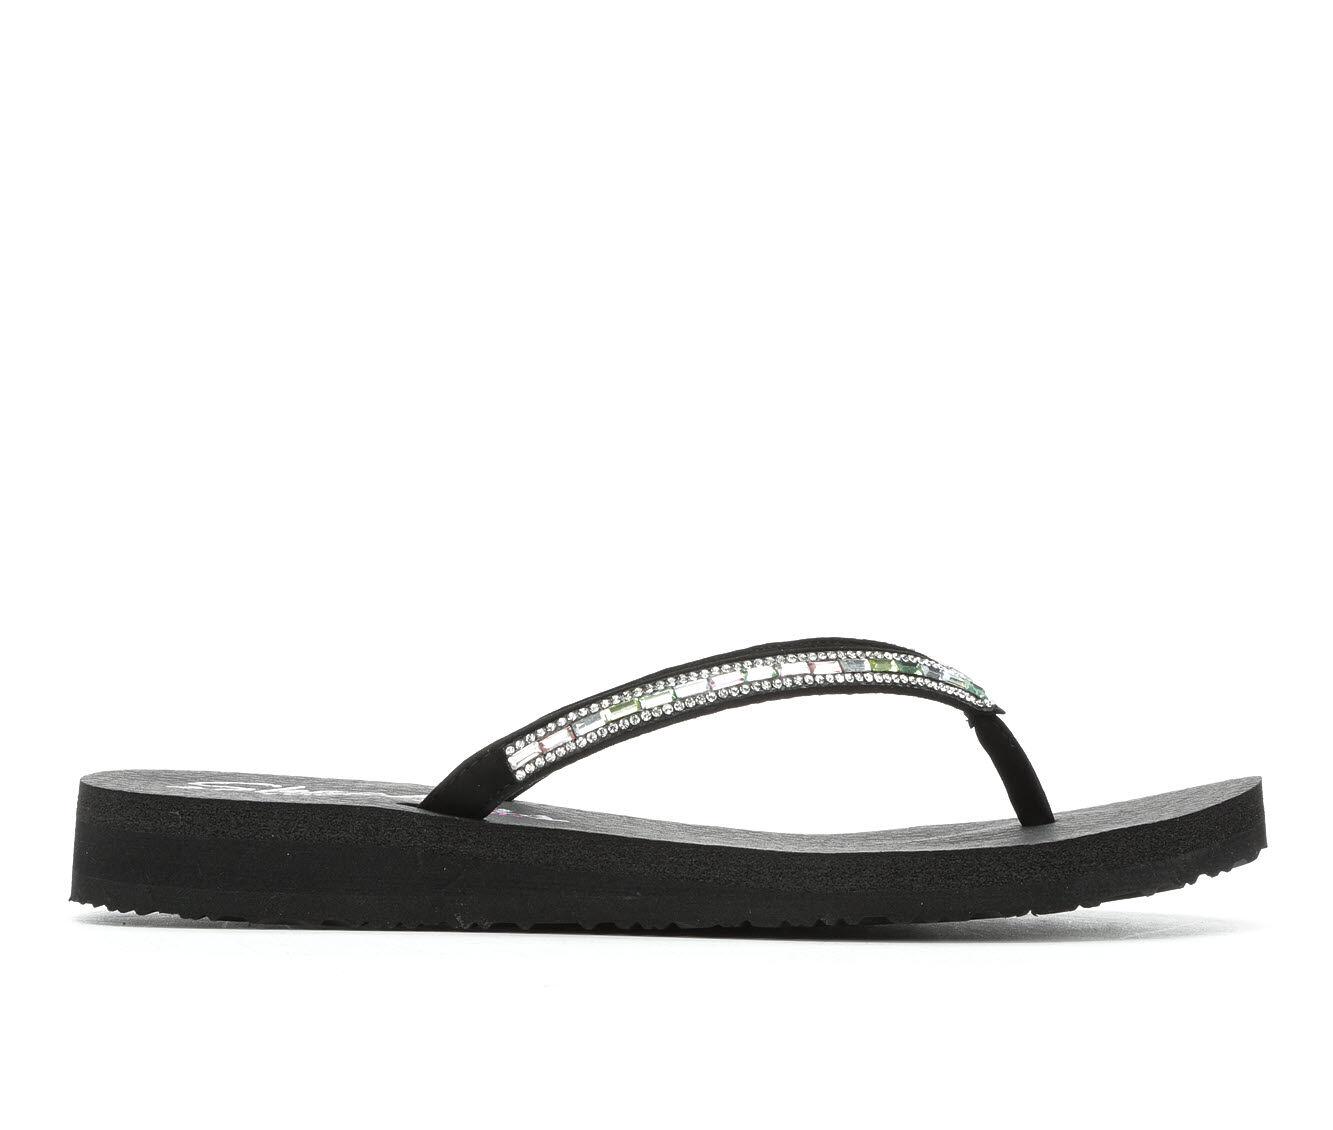 uk shoes_kd2748